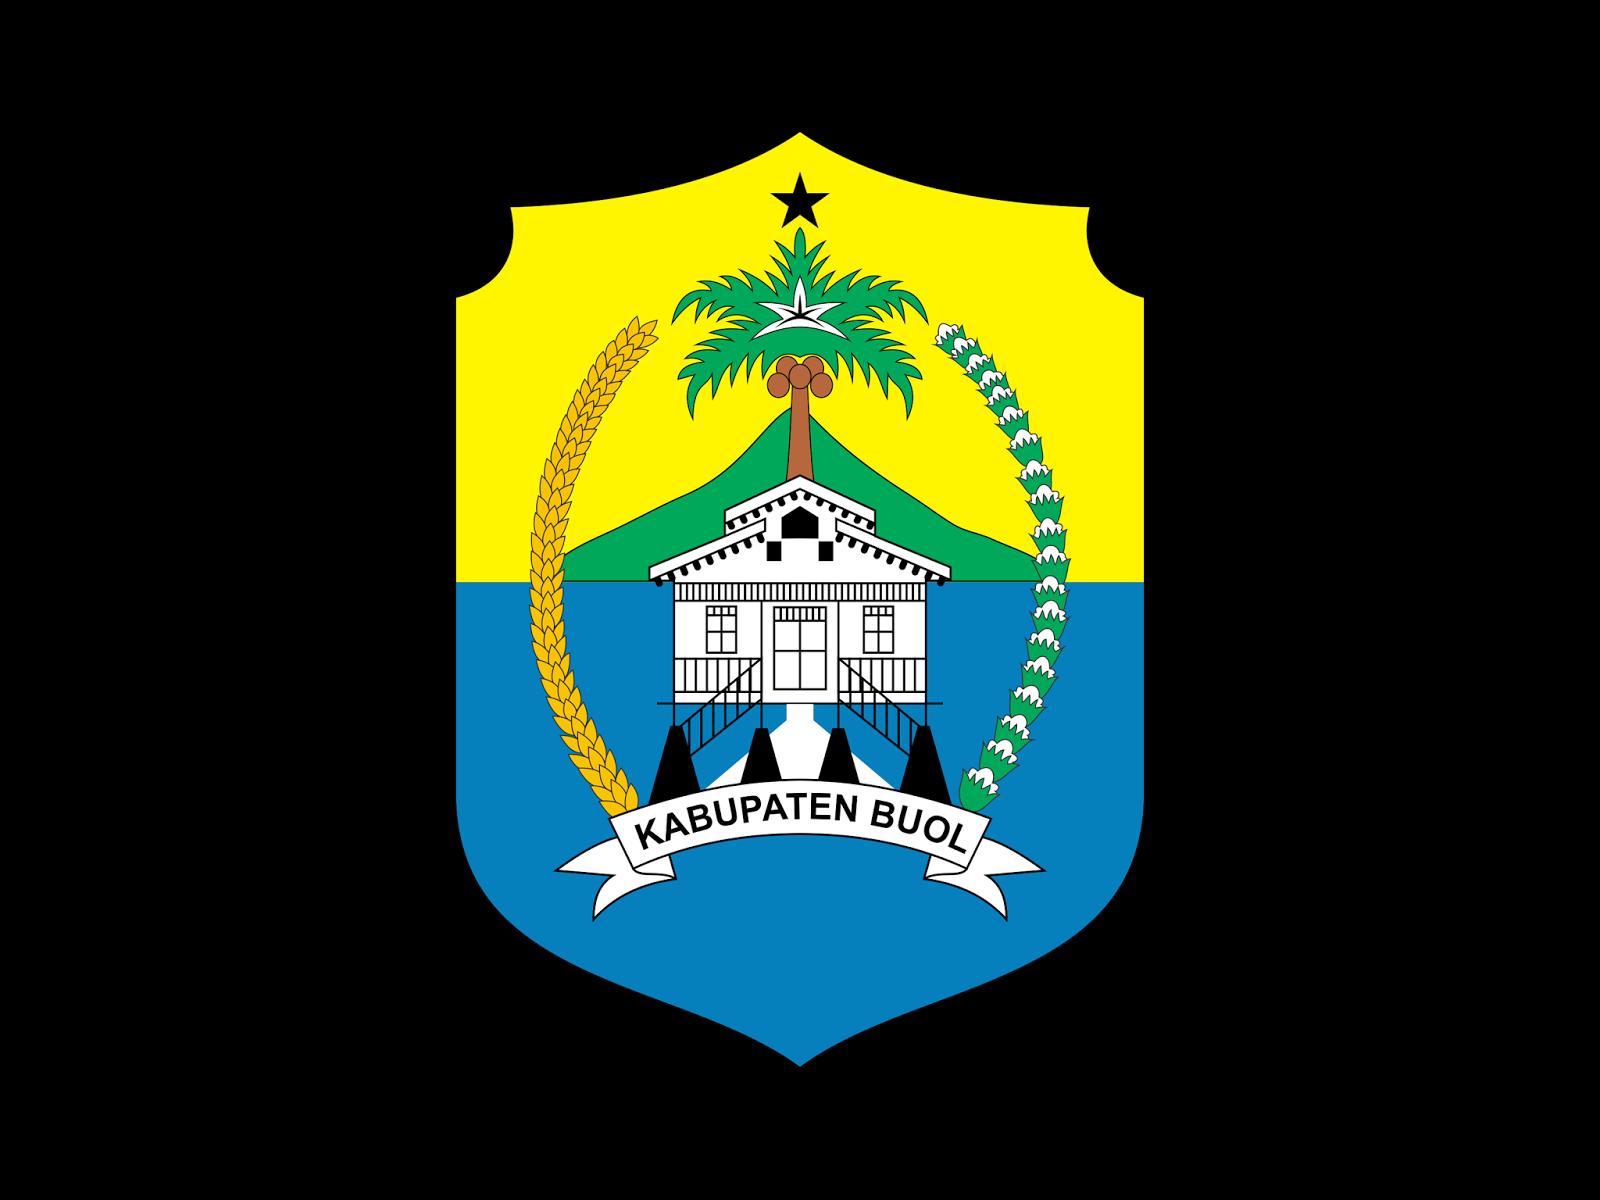 Logo Kabupaten Buol Vector Cdr Png Hd Biologizone